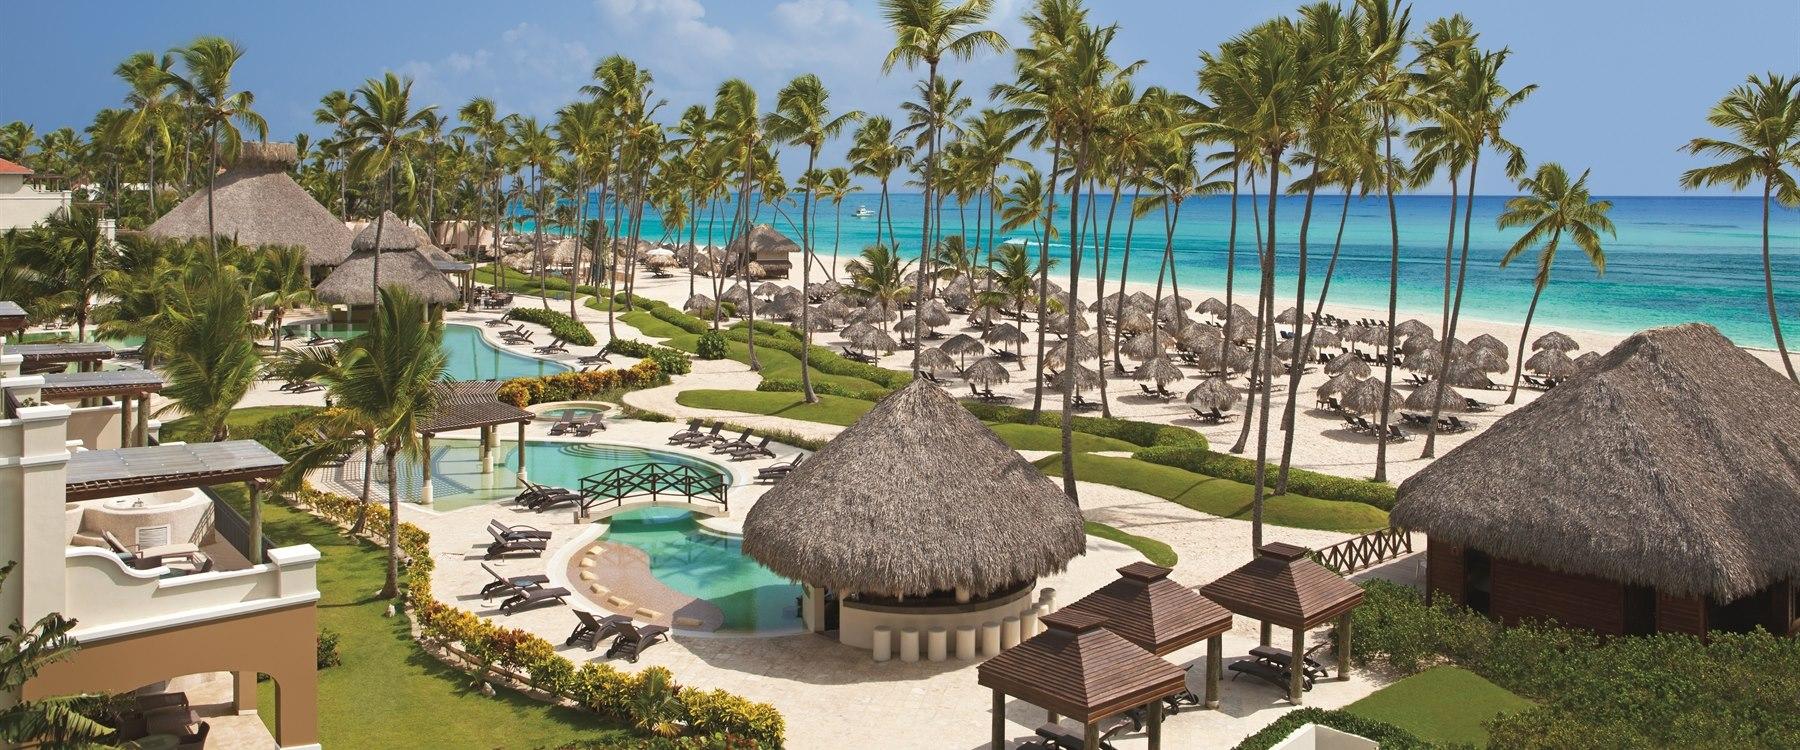 Secrets Royal Beach Punta Cana Luxury